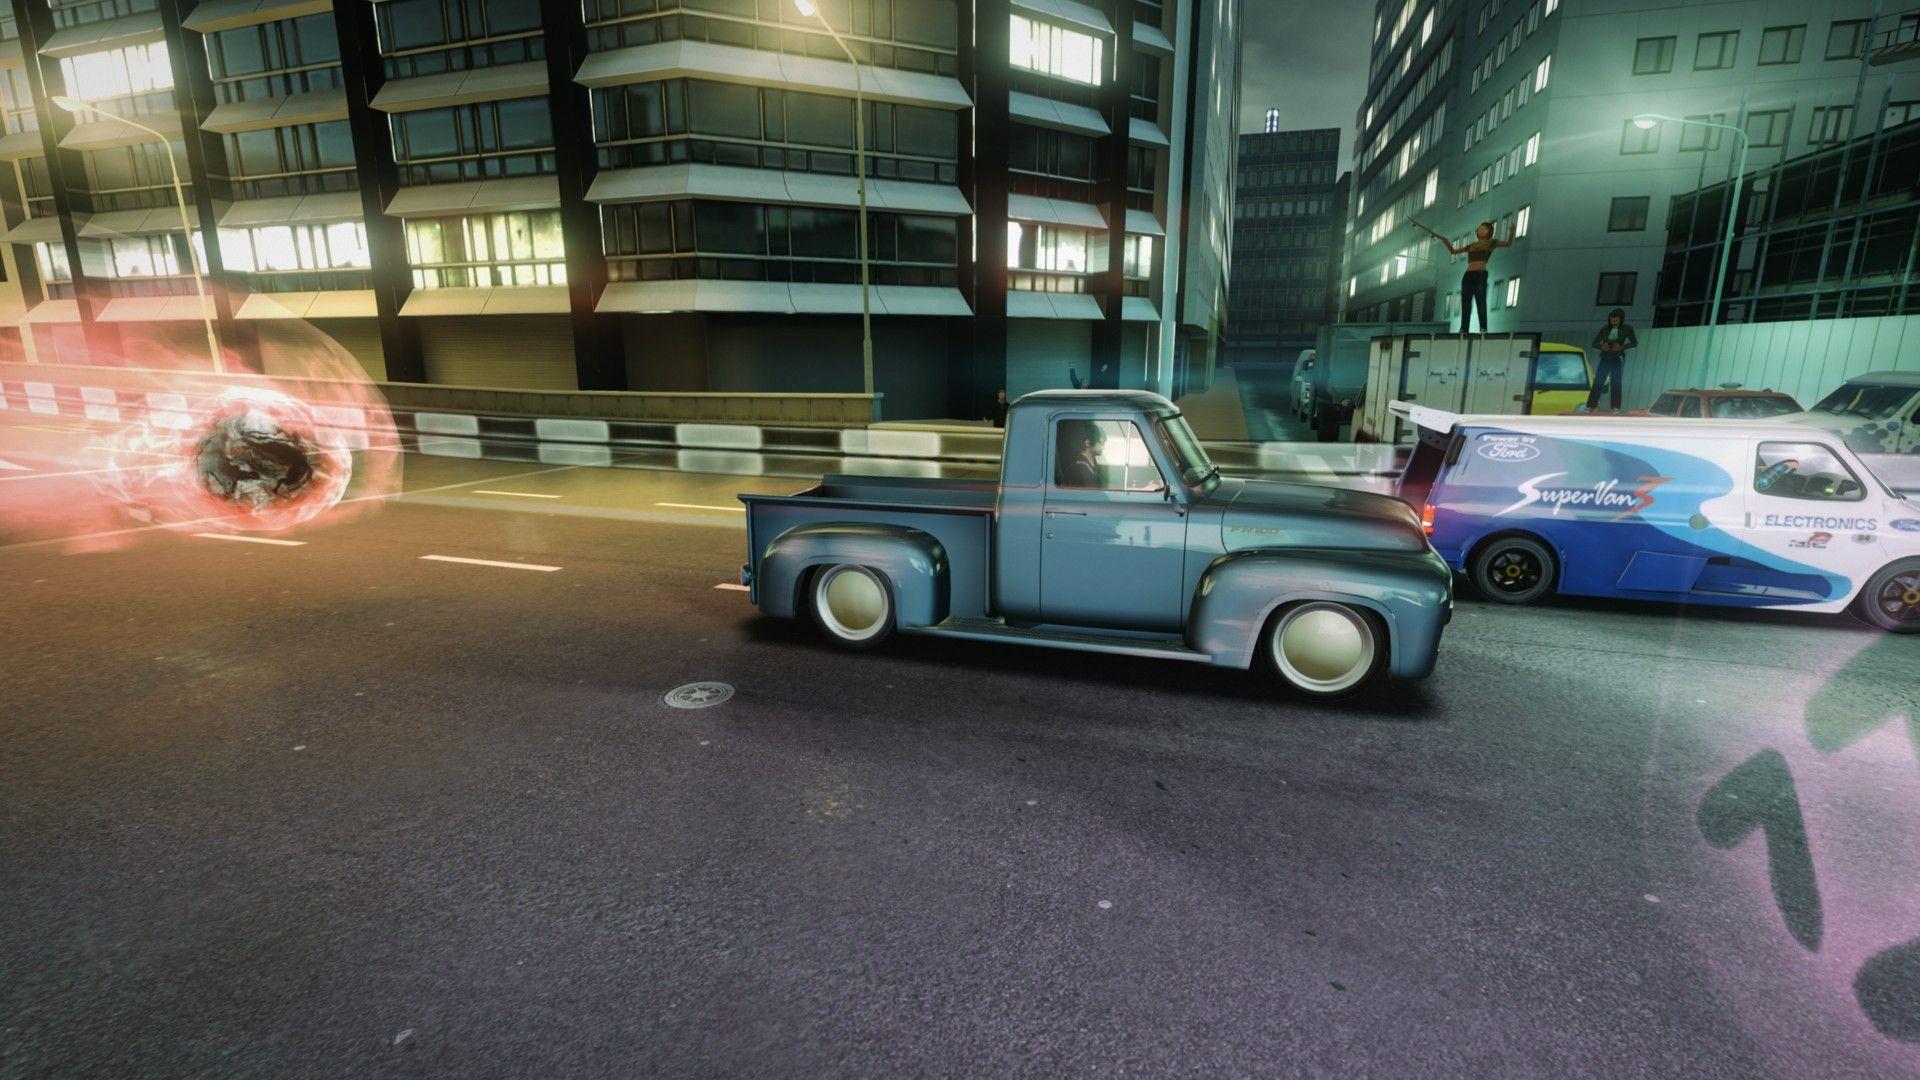 Blur racing game